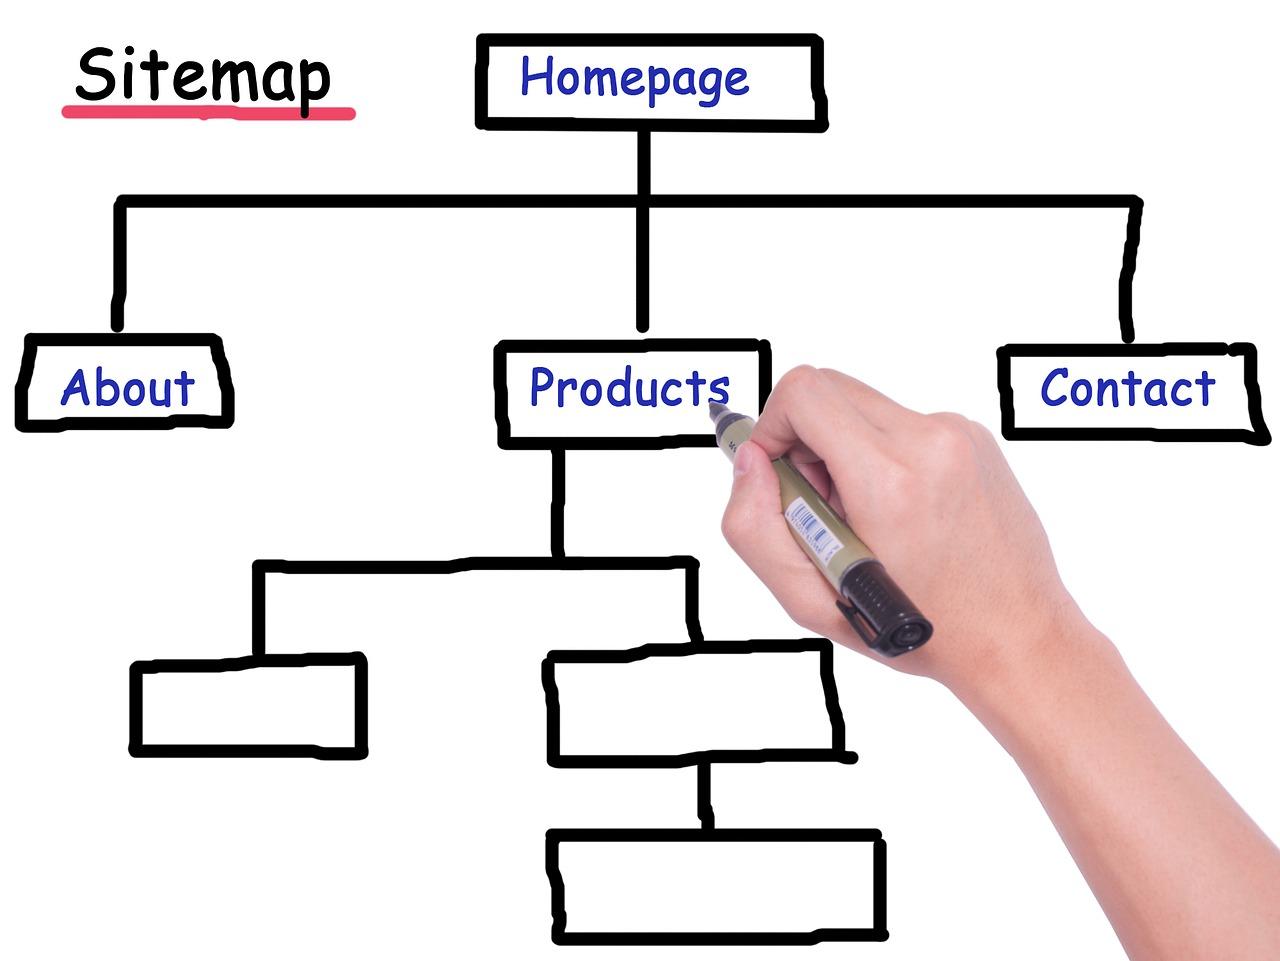 sitemap pedigree website hierarchy 2488231